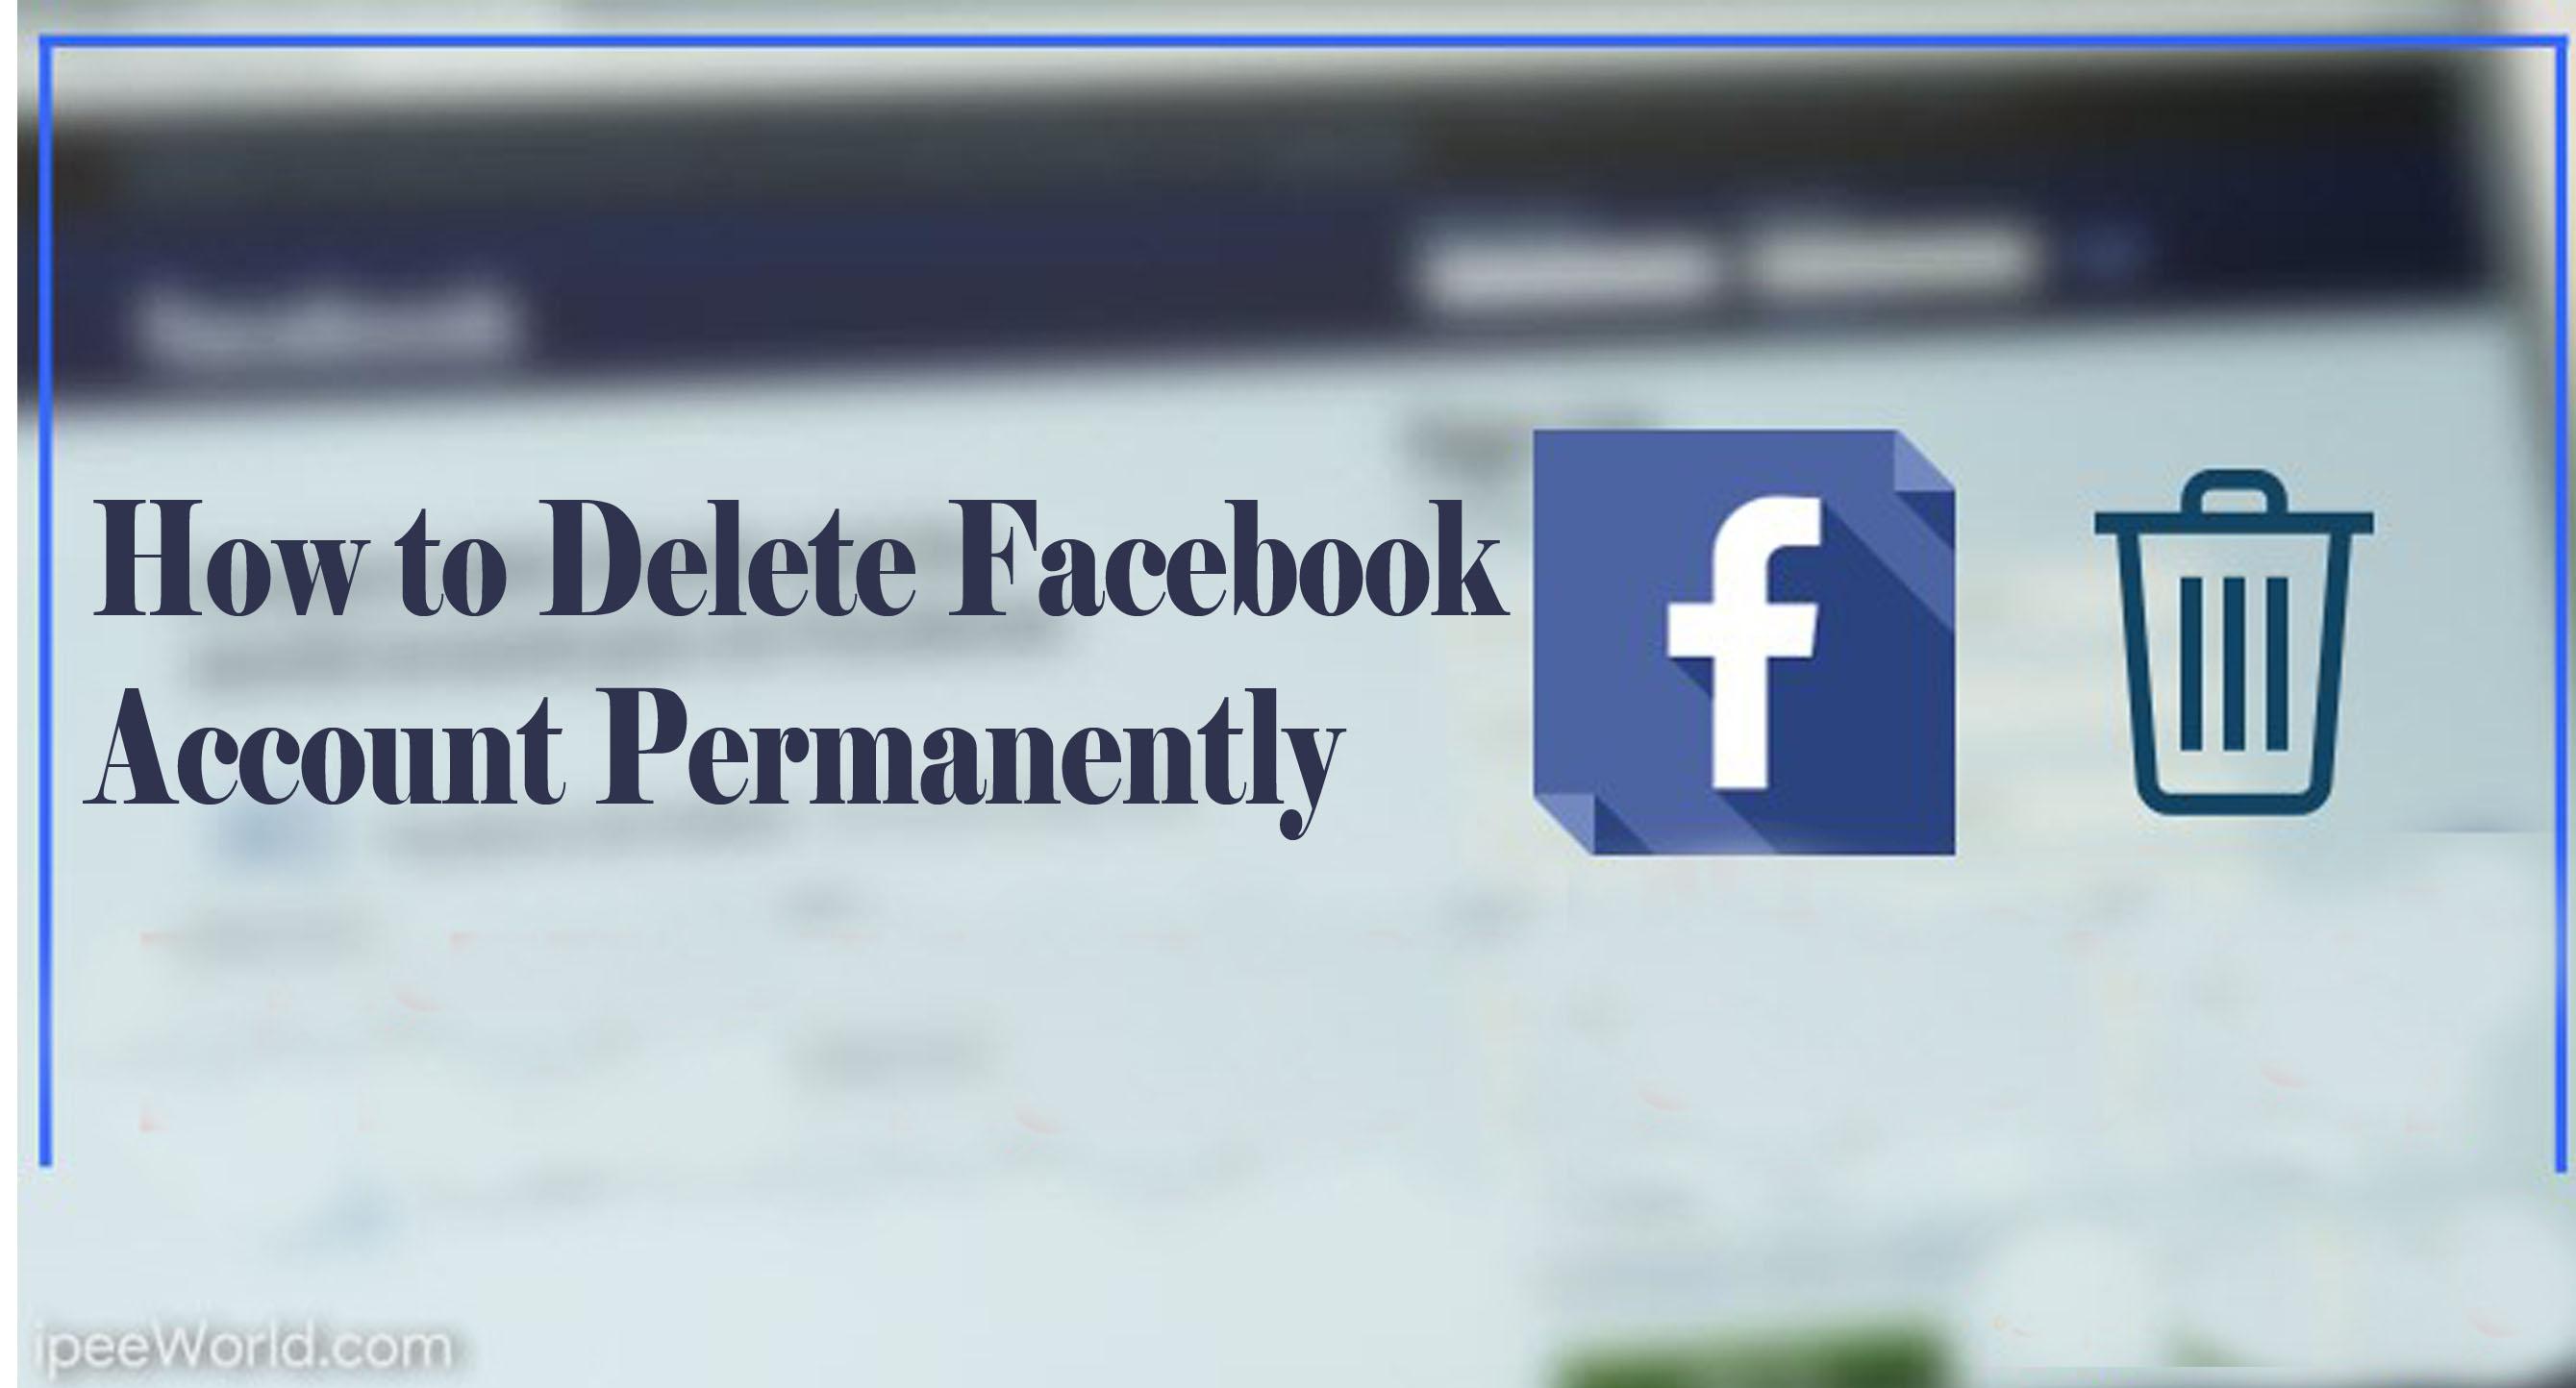 Delete Facebook Account – Delete Facebook Account Permanently